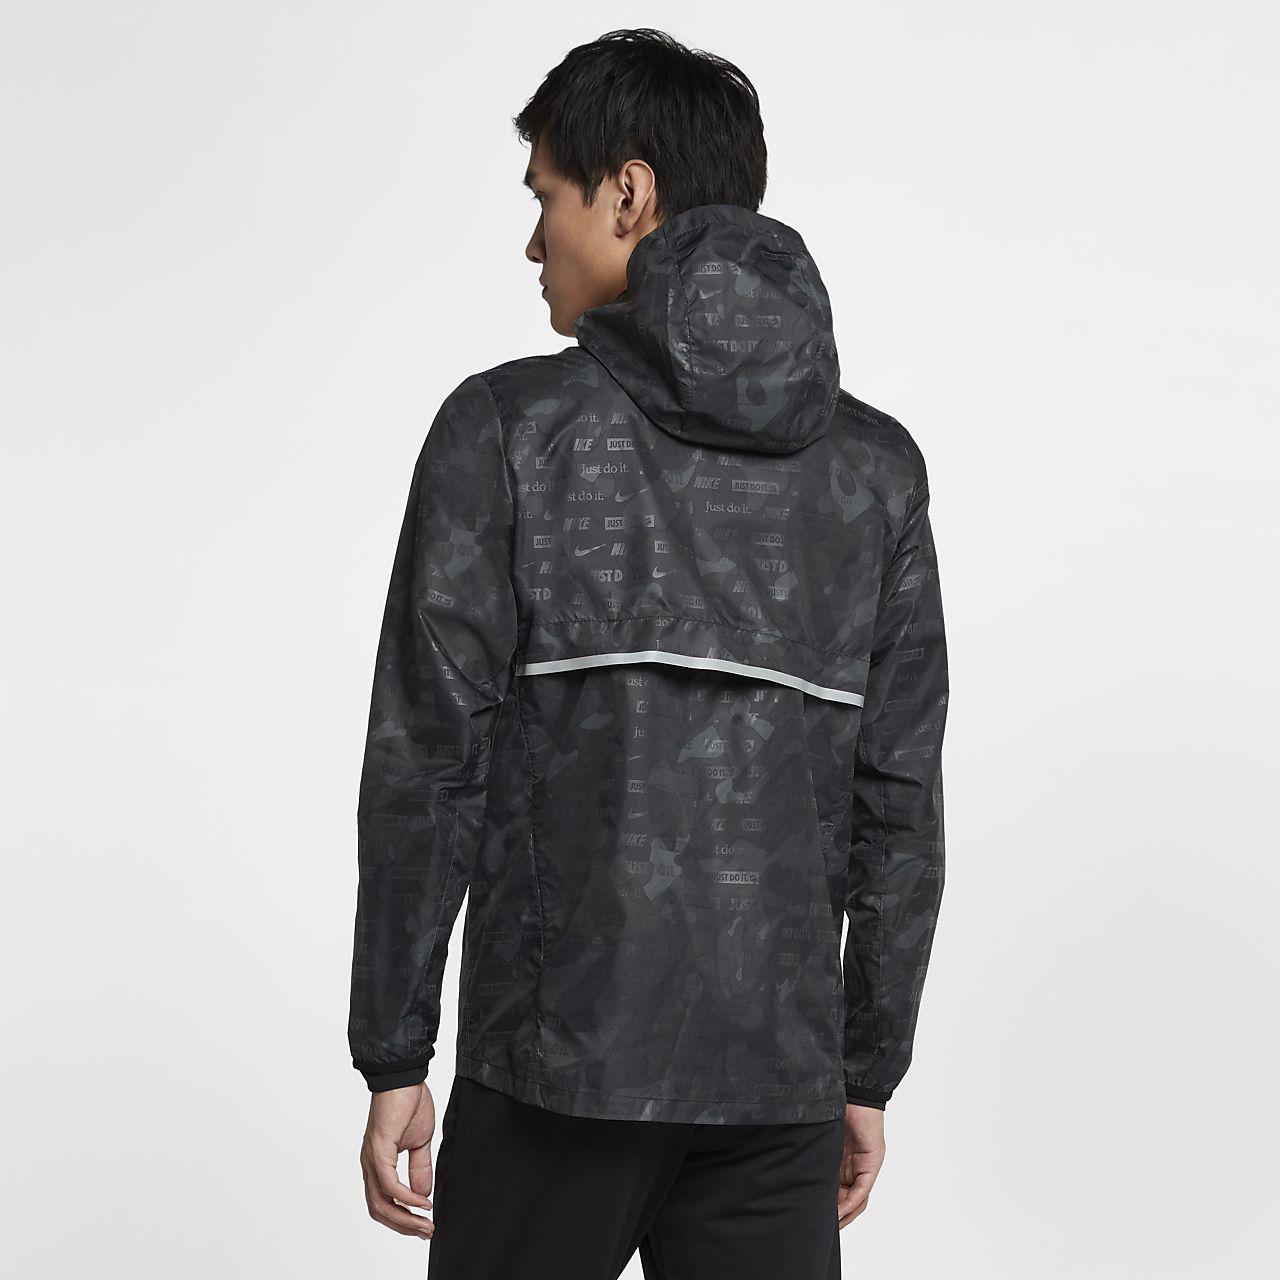 48a14641f389 Nike Shield Ghost Flash Men s Running Jacket. Nike.com CA